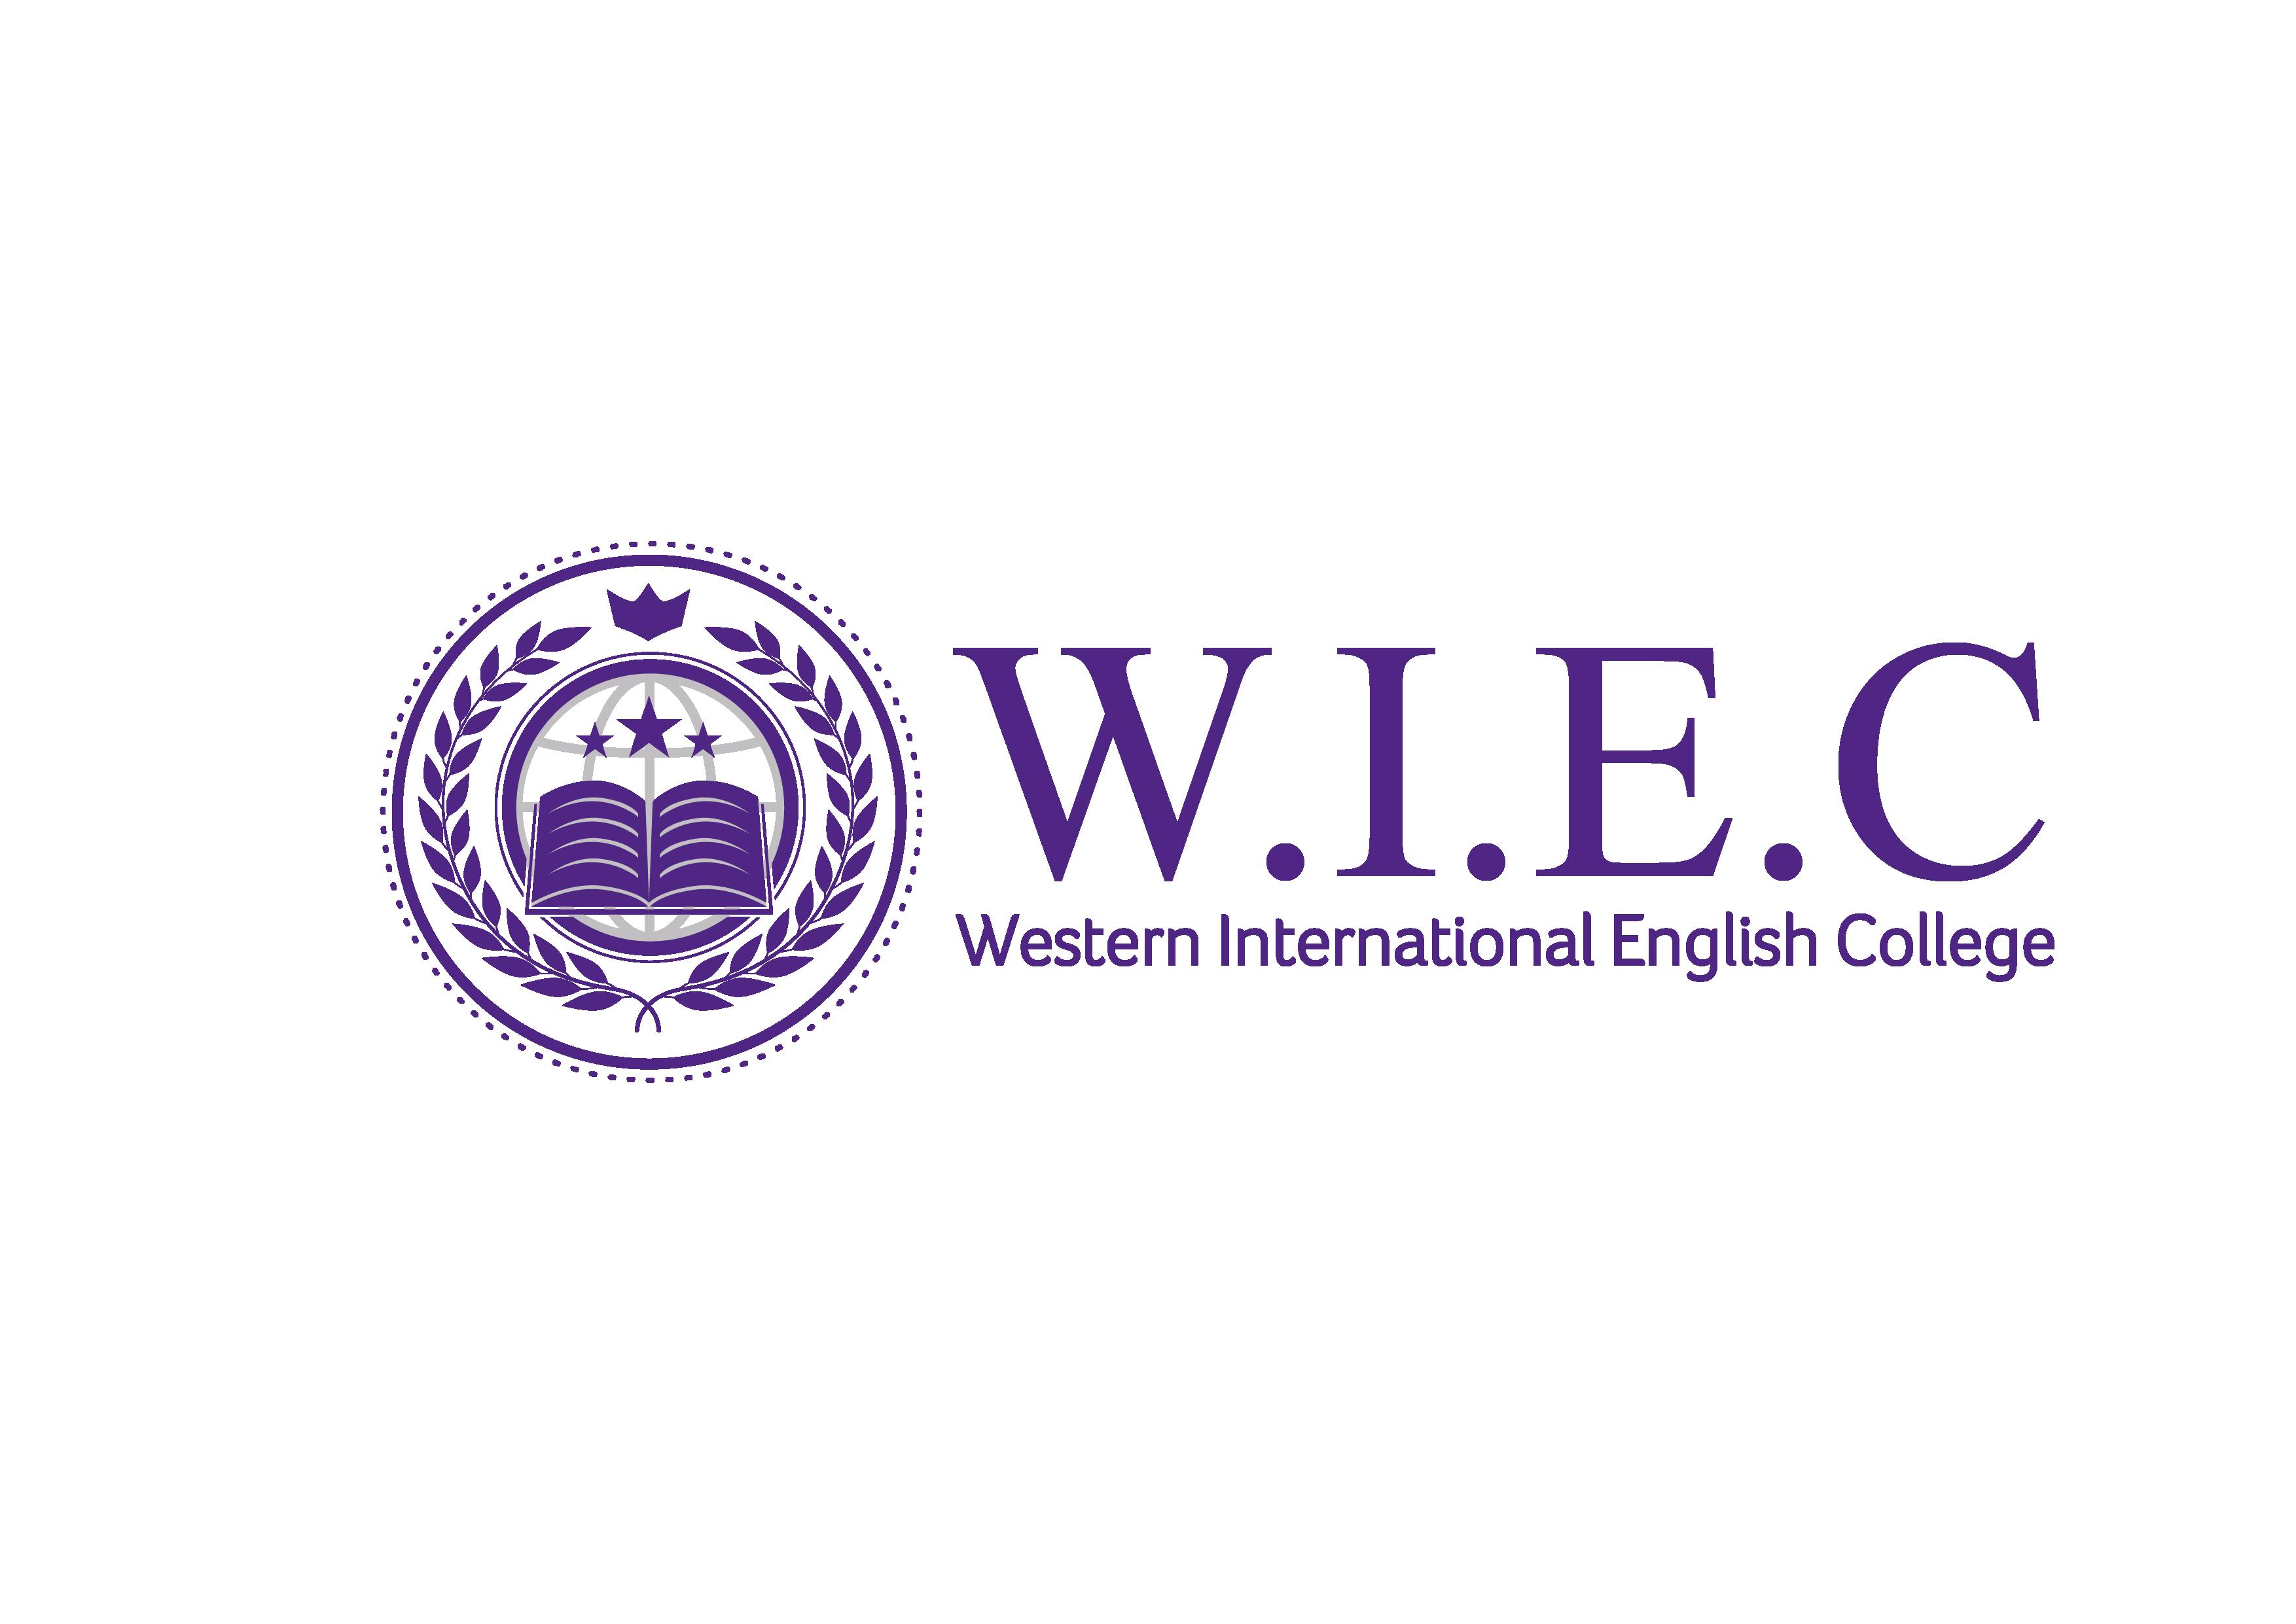 Western International English College